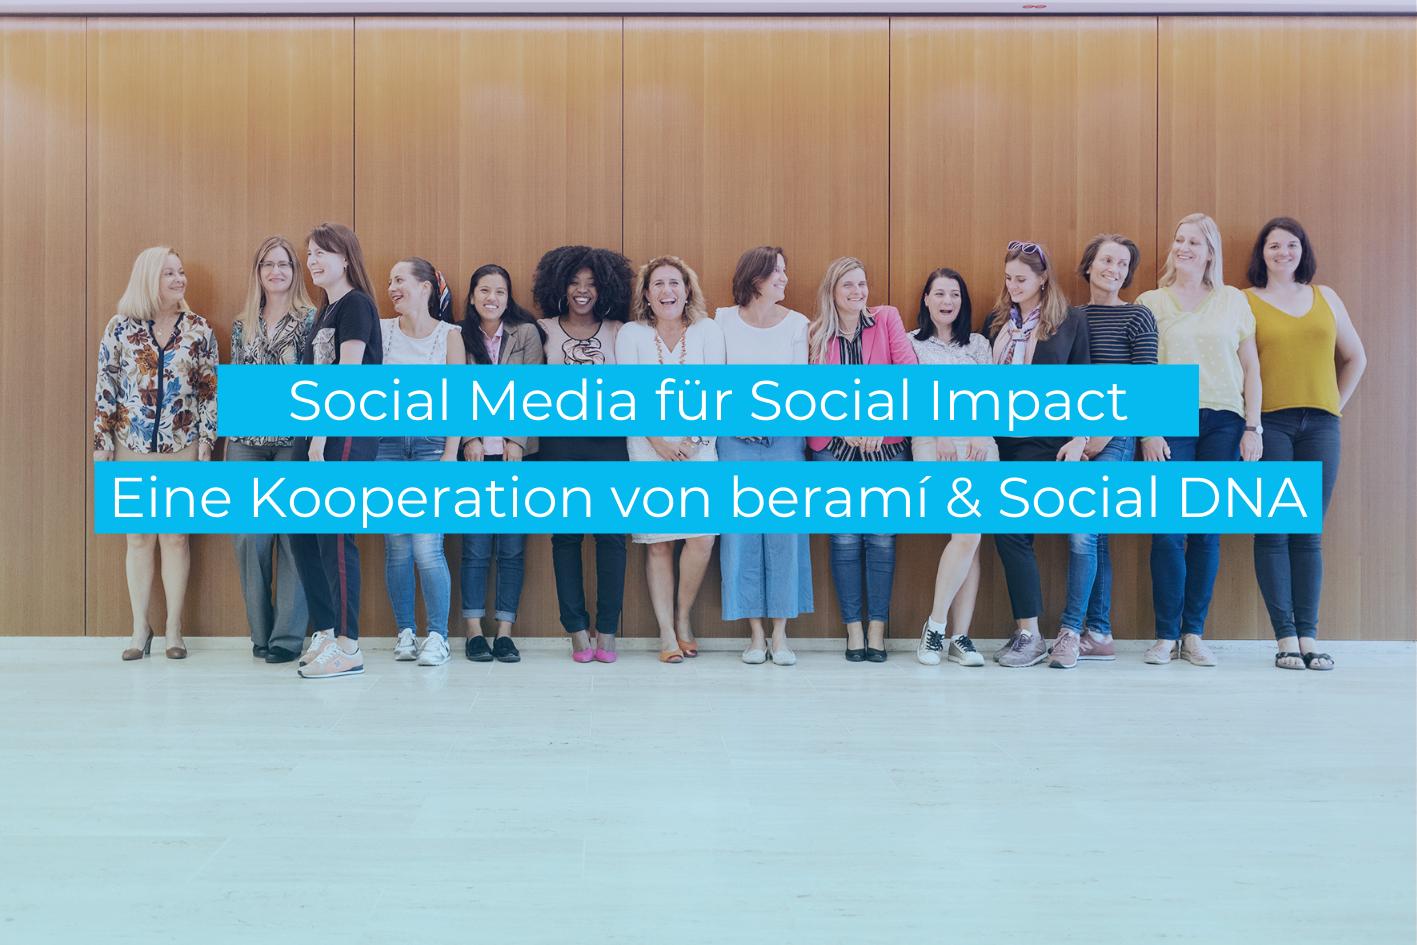 Social Media für Social Impact - Eine Kooperation von beramí & Social DNA